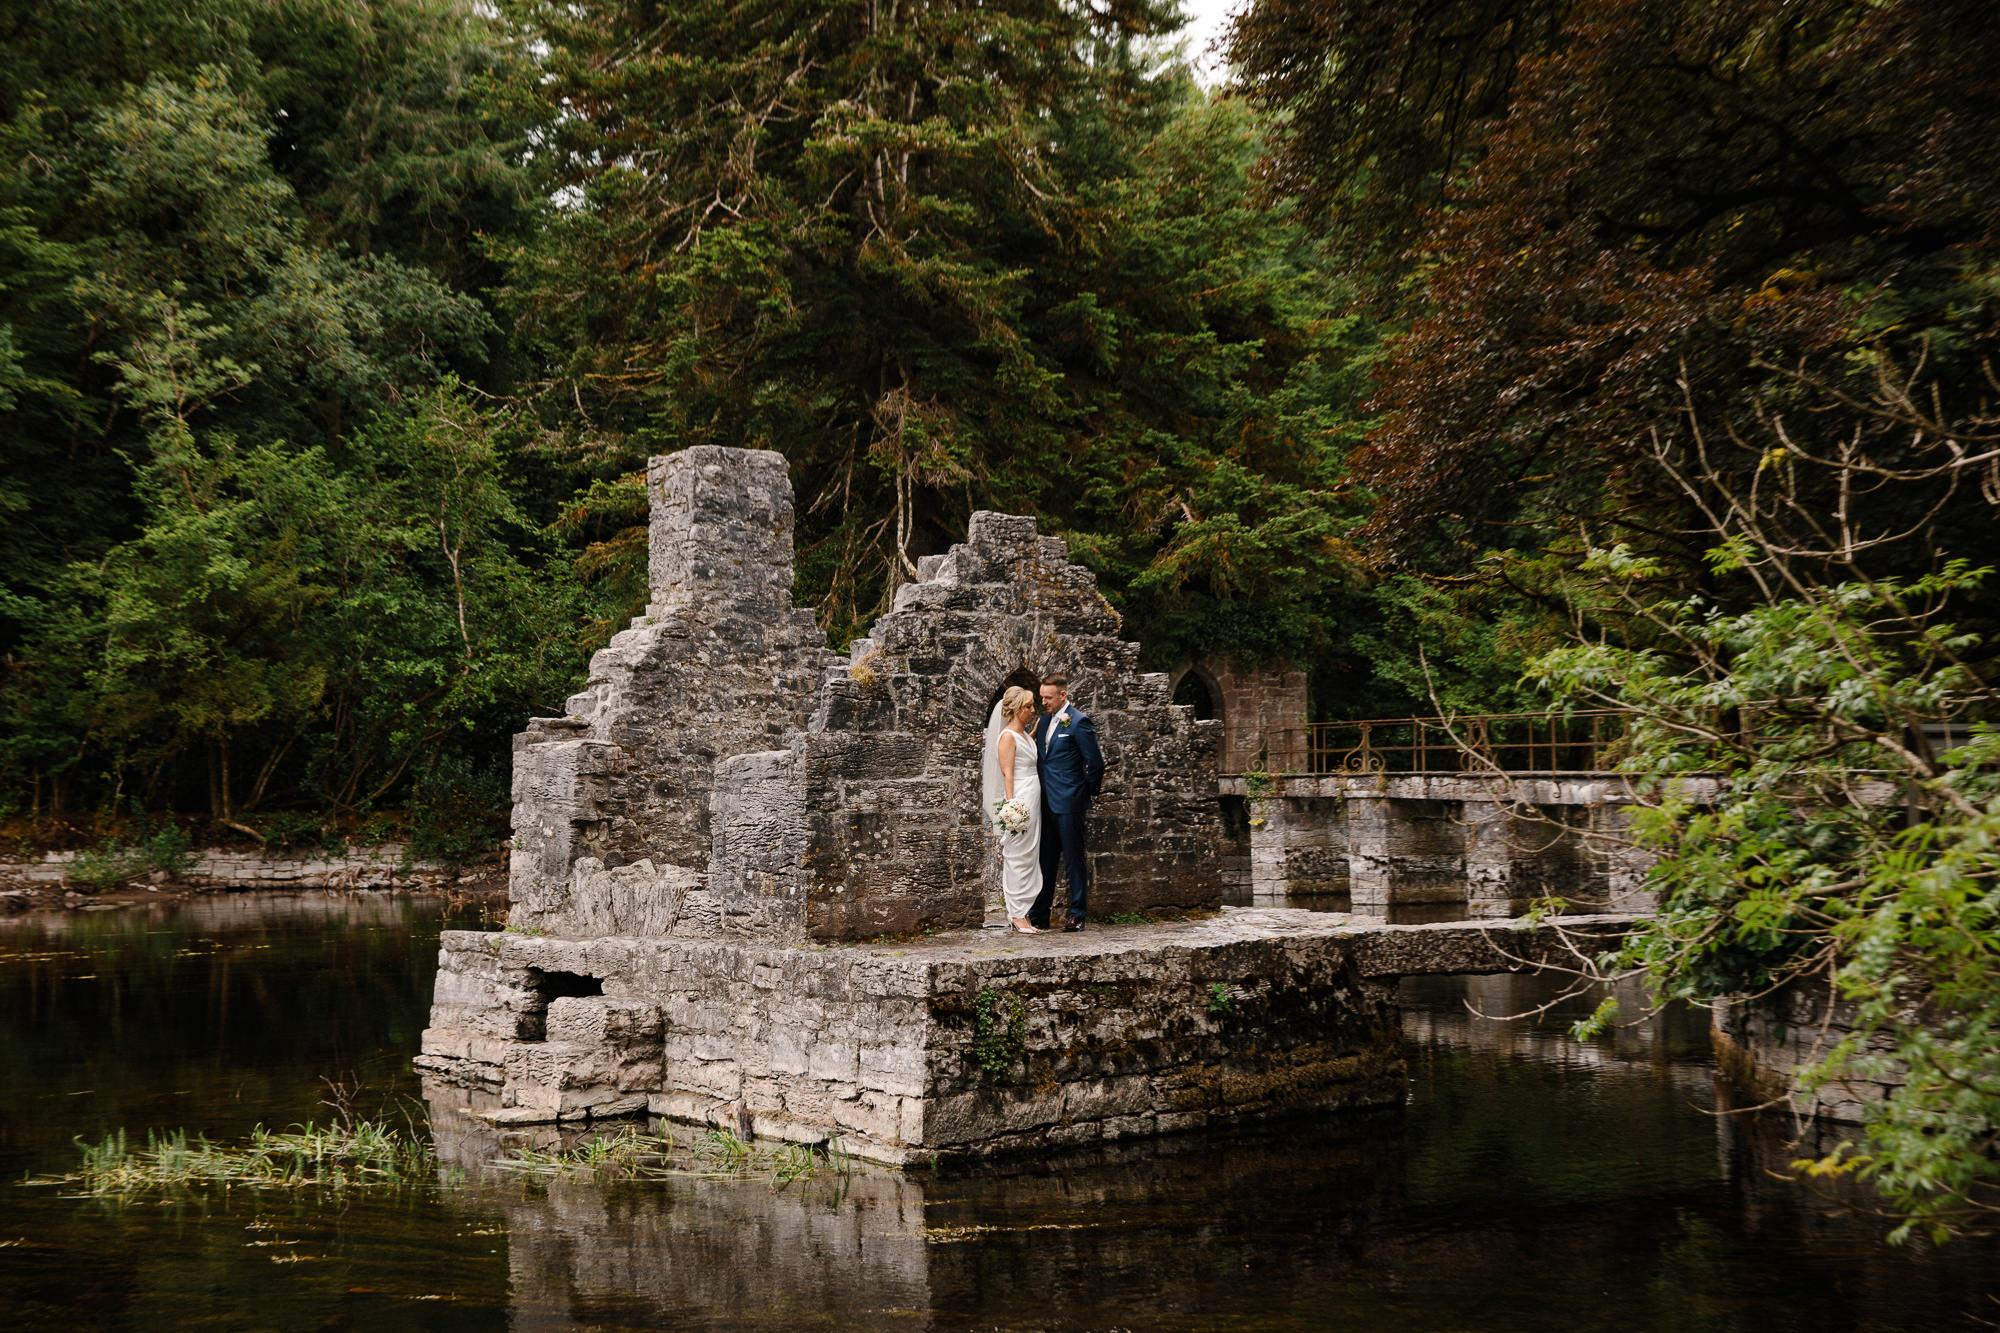 Vanessa & Gerard // The Lodge at Ashford Castle